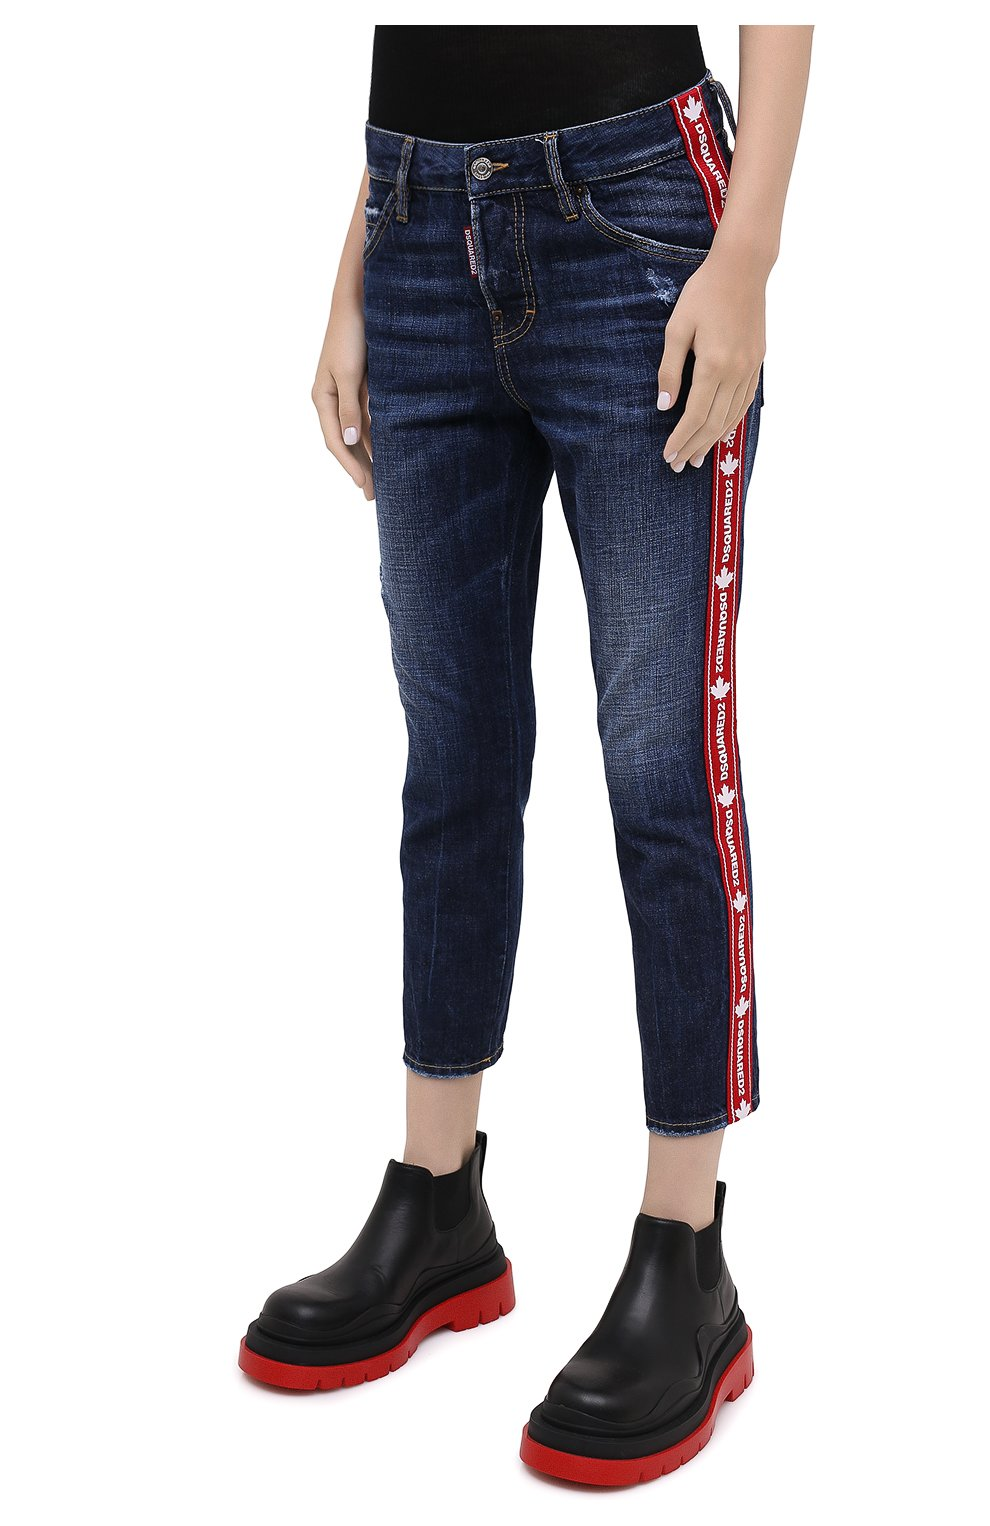 Женские джинсы DSQUARED2 синего цвета, арт. S75LB0411/S30309   Фото 4